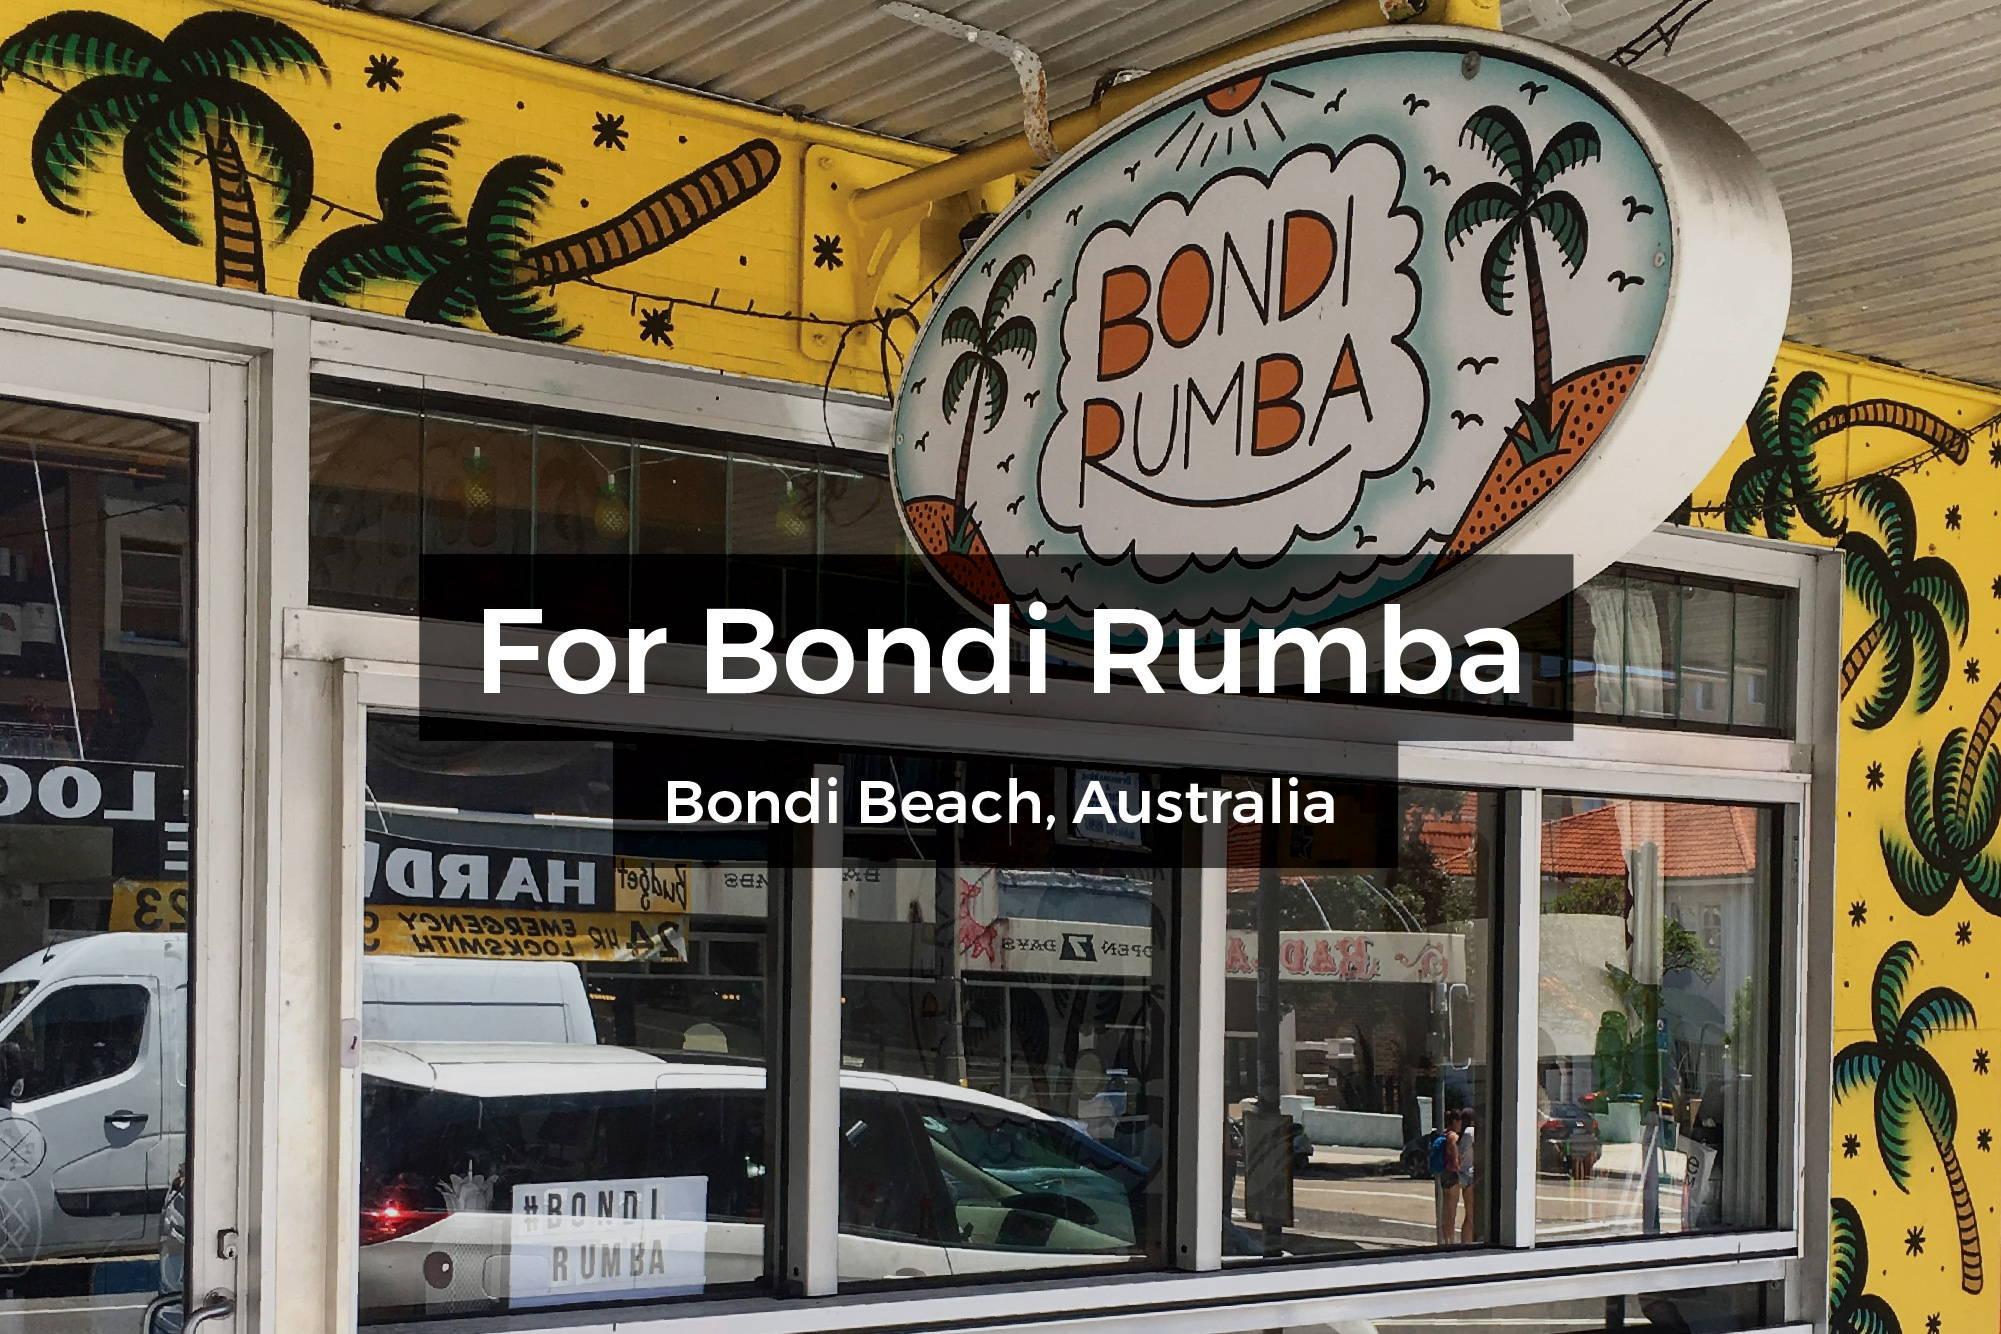 Bondi Rumba mural in Bondi Beach, Australia by Steen Jones